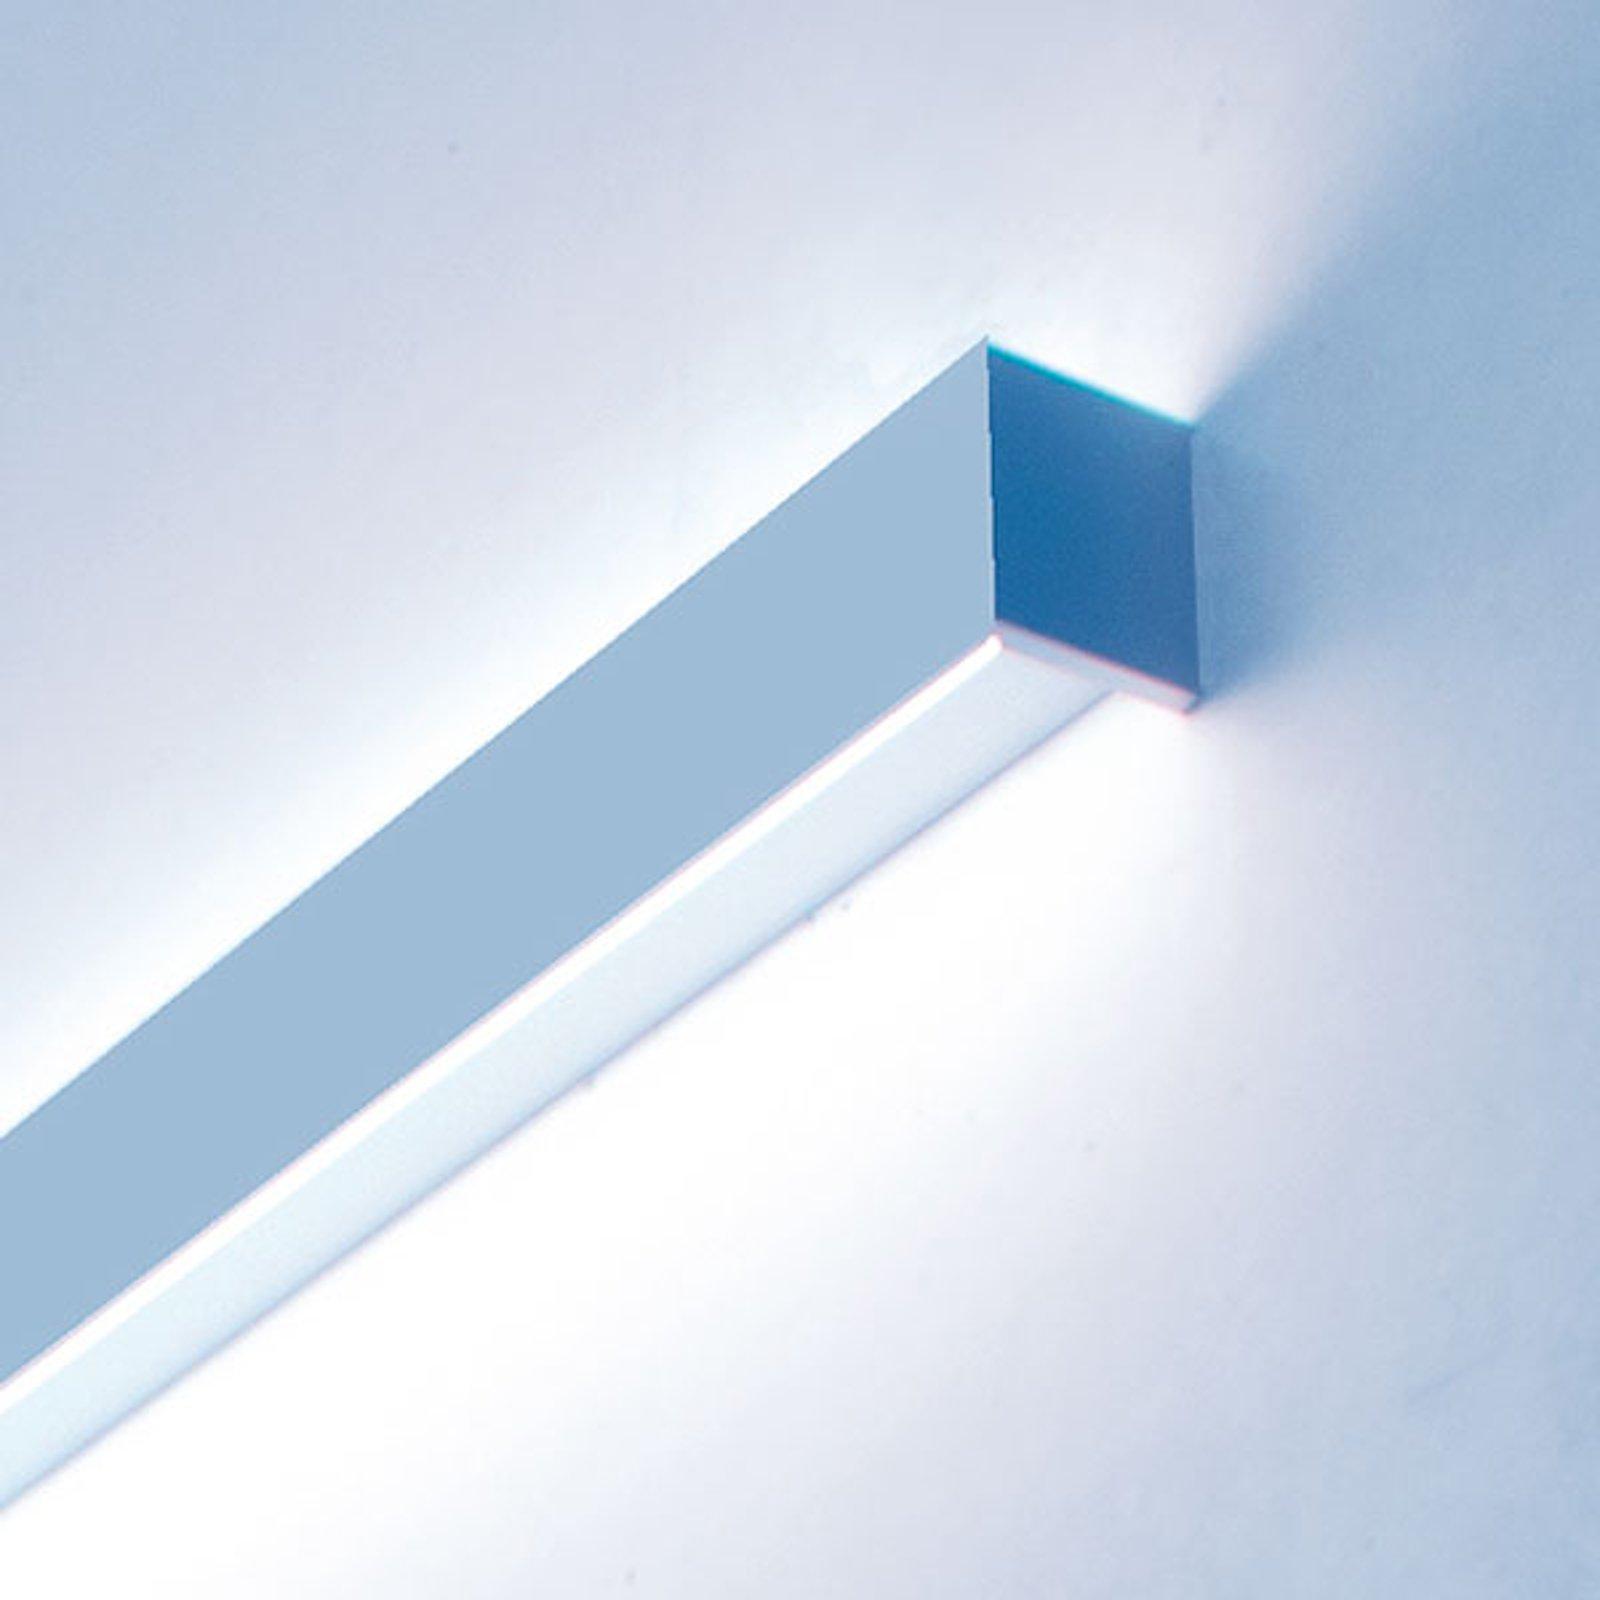 Matric W1 LED-vegglampe i 118,5 cm, 3 000 K